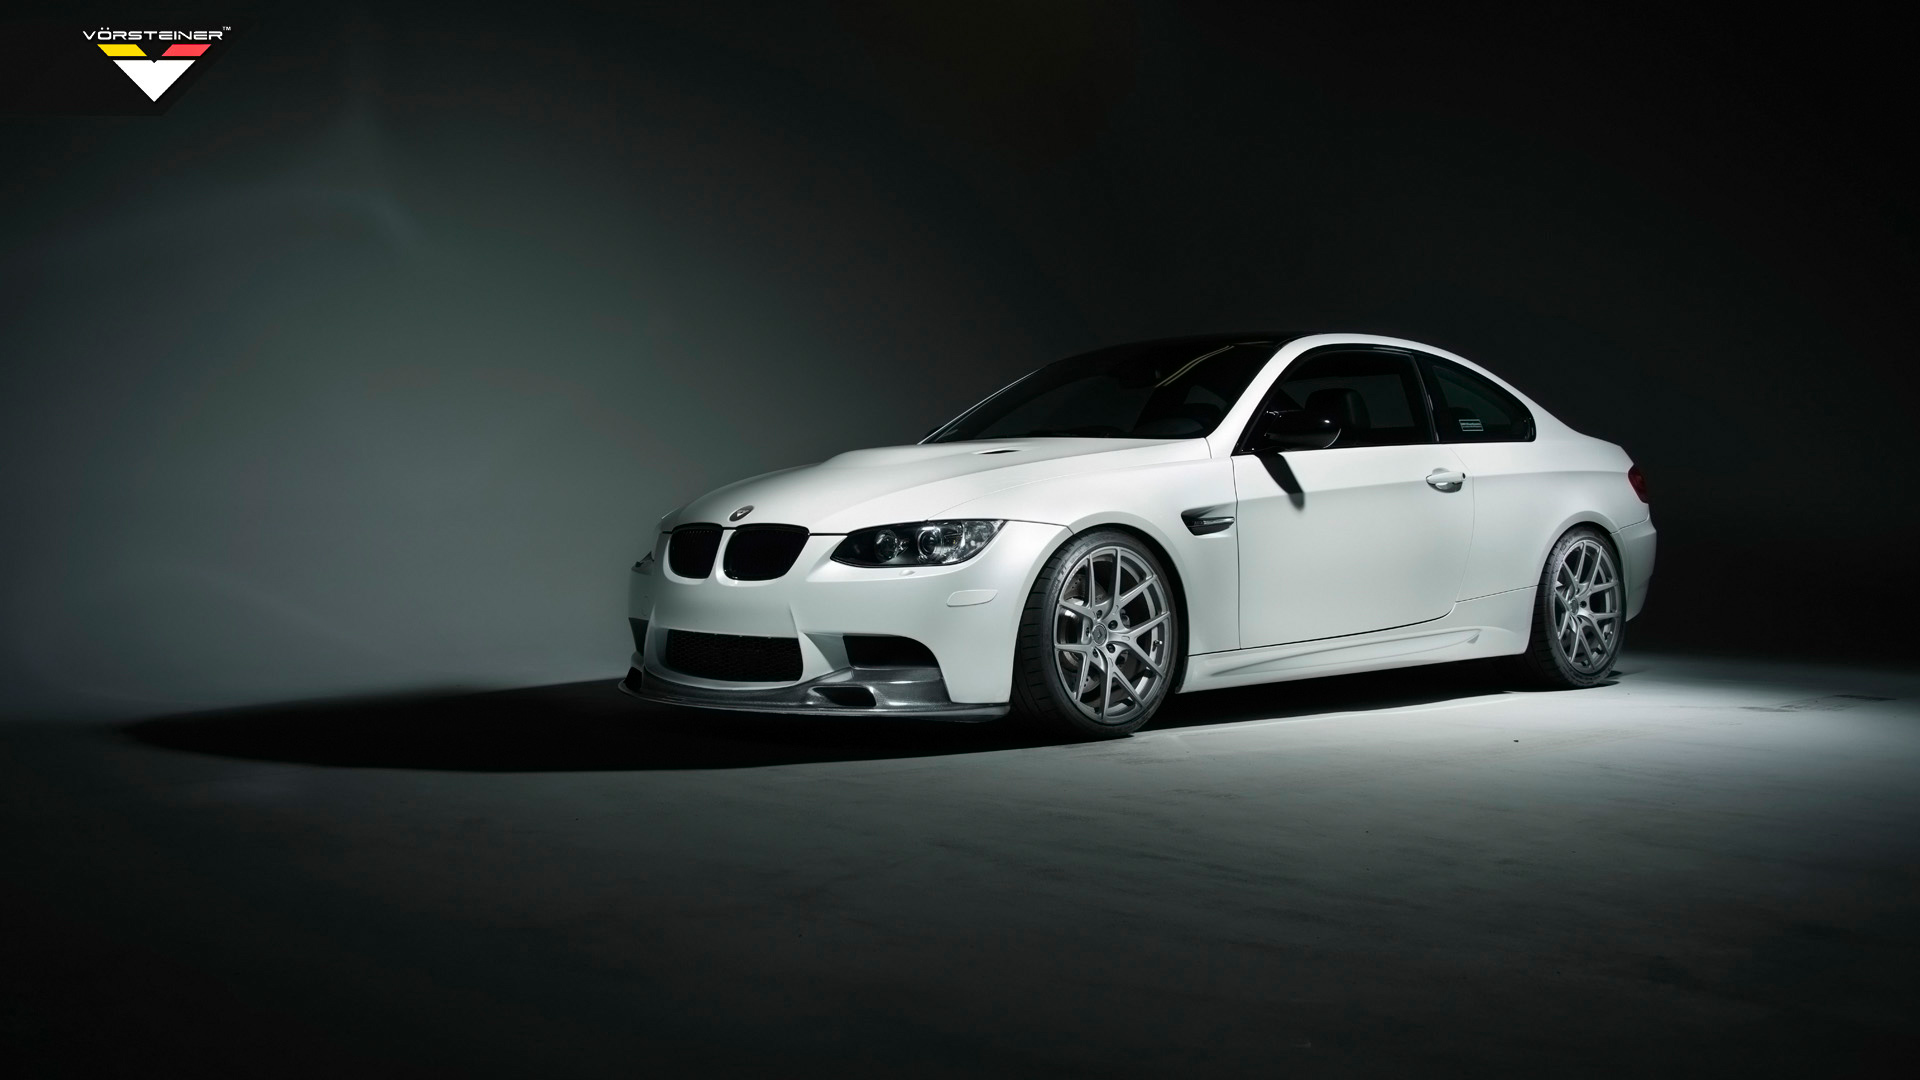 2014 BMW E92 M3 By Vorsteiner Wallpaper | HD Car Wallpapers